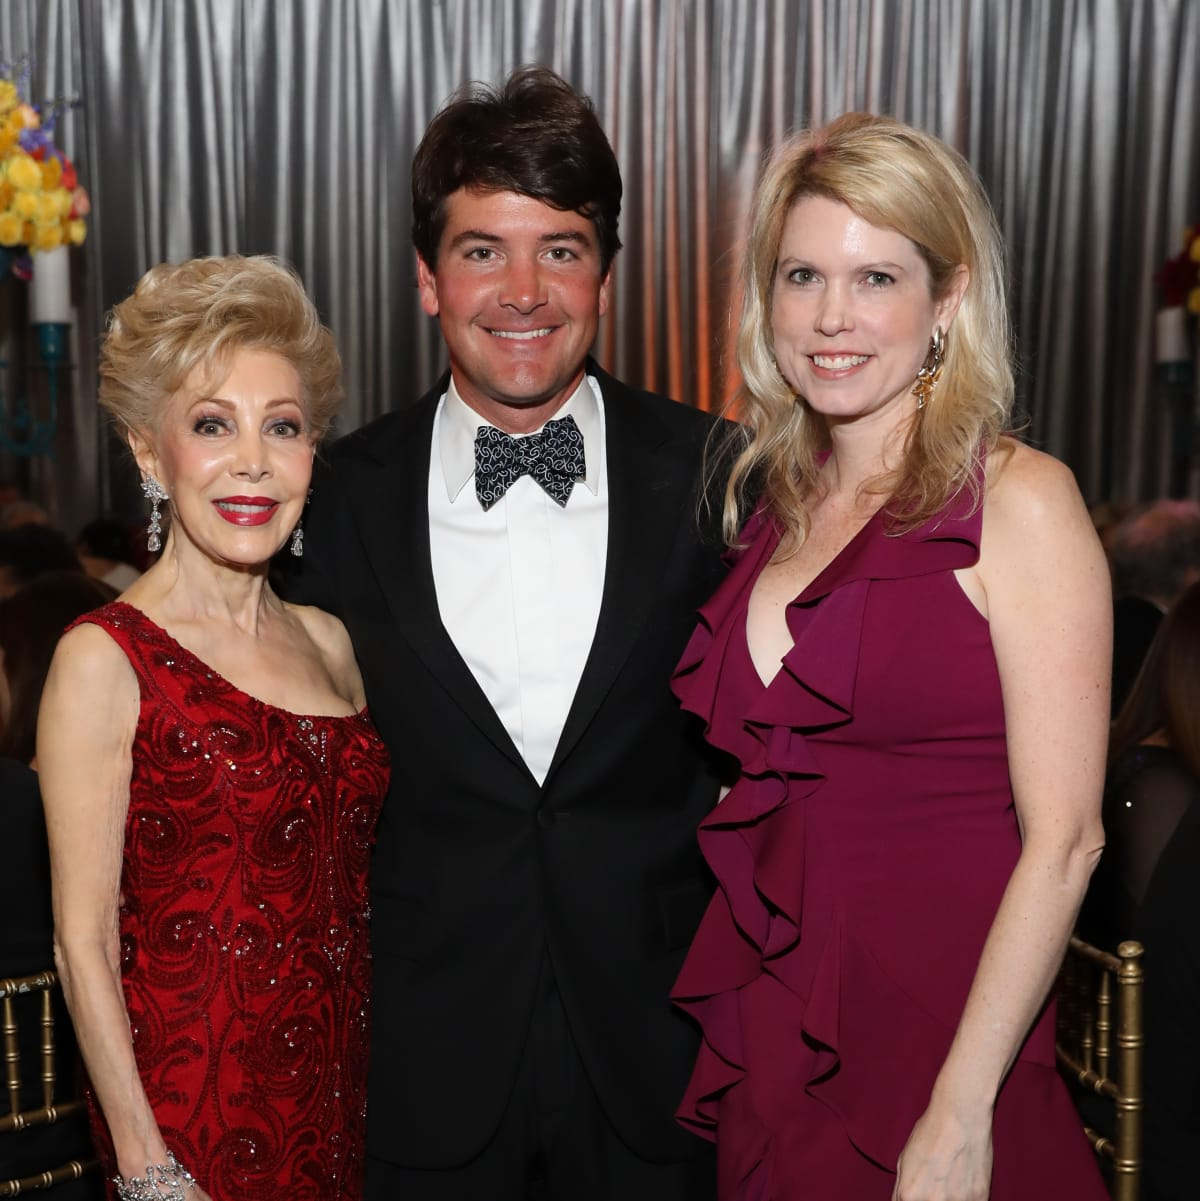 Margaret Alkek Williams, Courtney and Bill Toomey at Houston Grand Opera opening night 2017